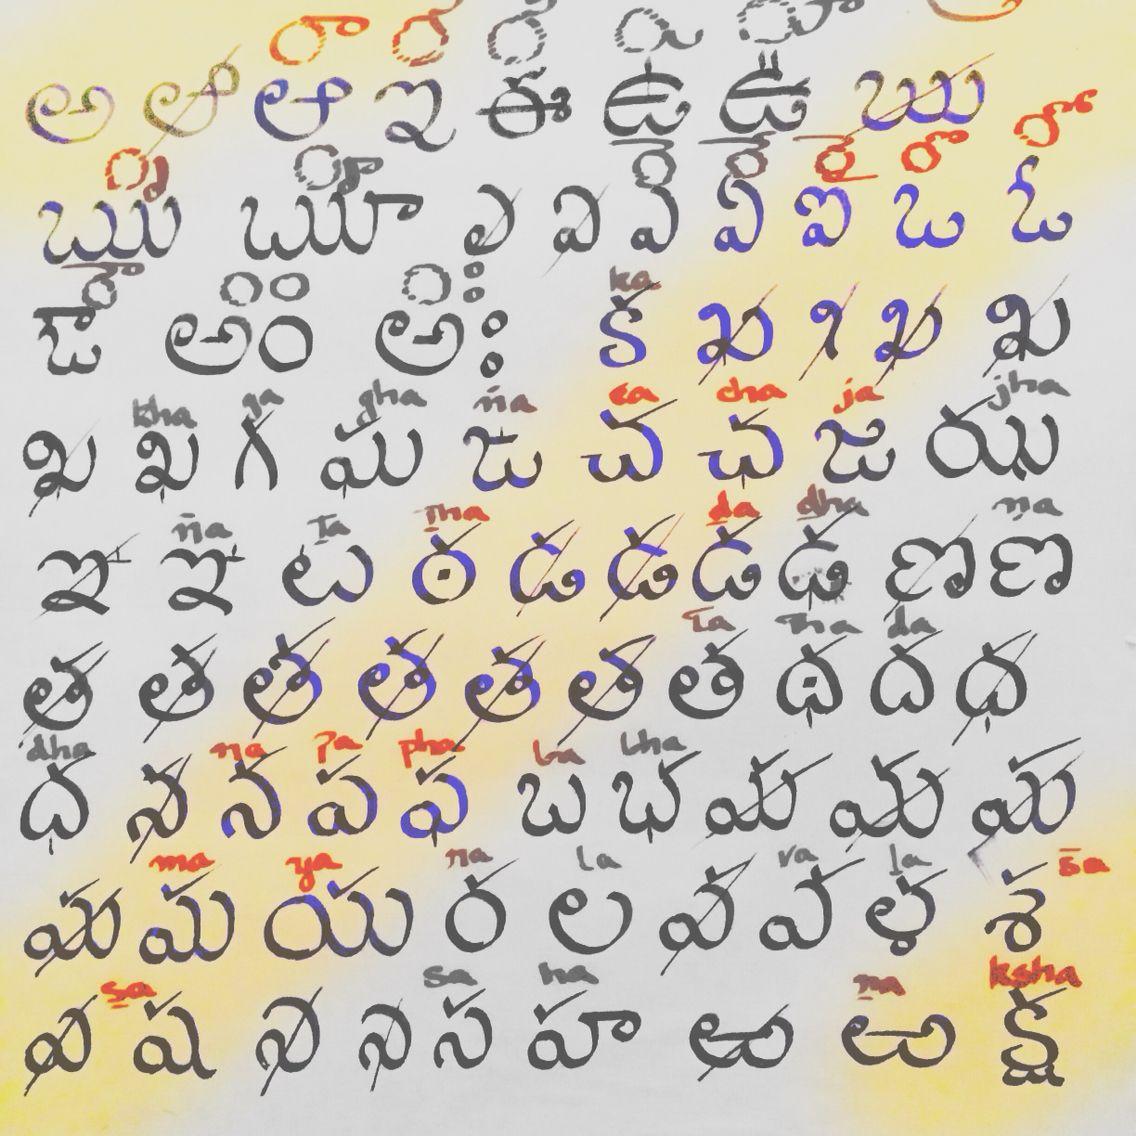 Telugu alphabet | Calligraphy: Bespoke | Calligraphy, Arabic